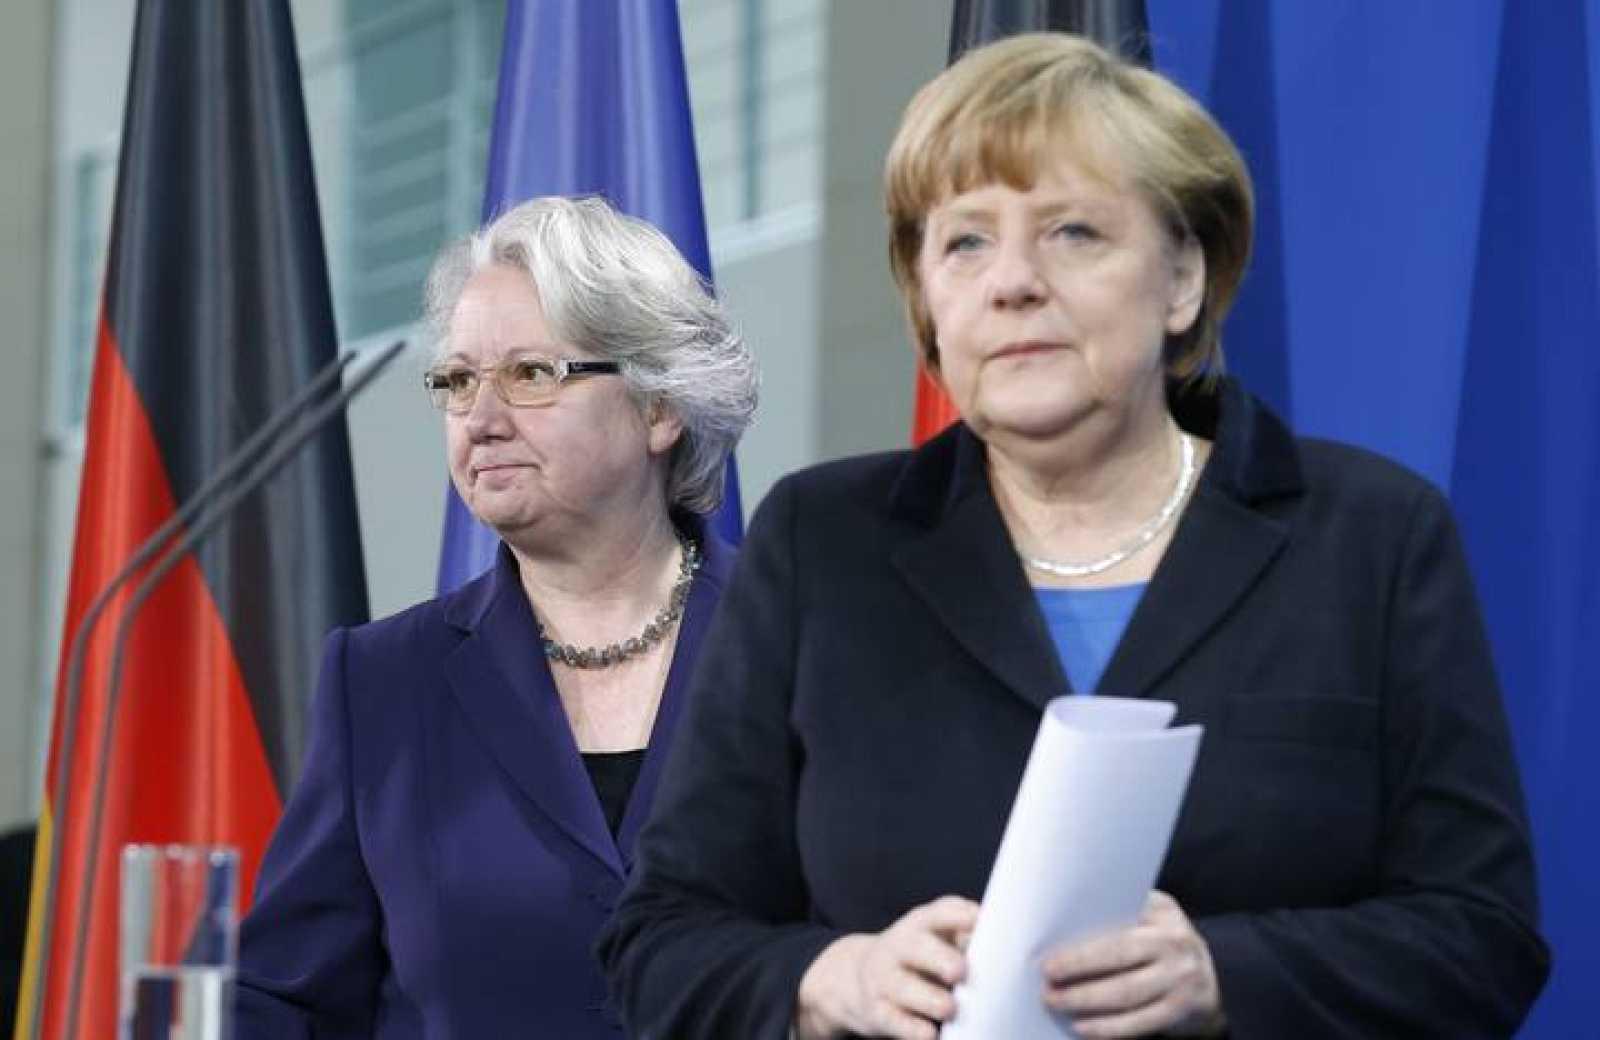 German Chancellor Merkel and Education Minister Schavan arrive for statement to media in Berlin